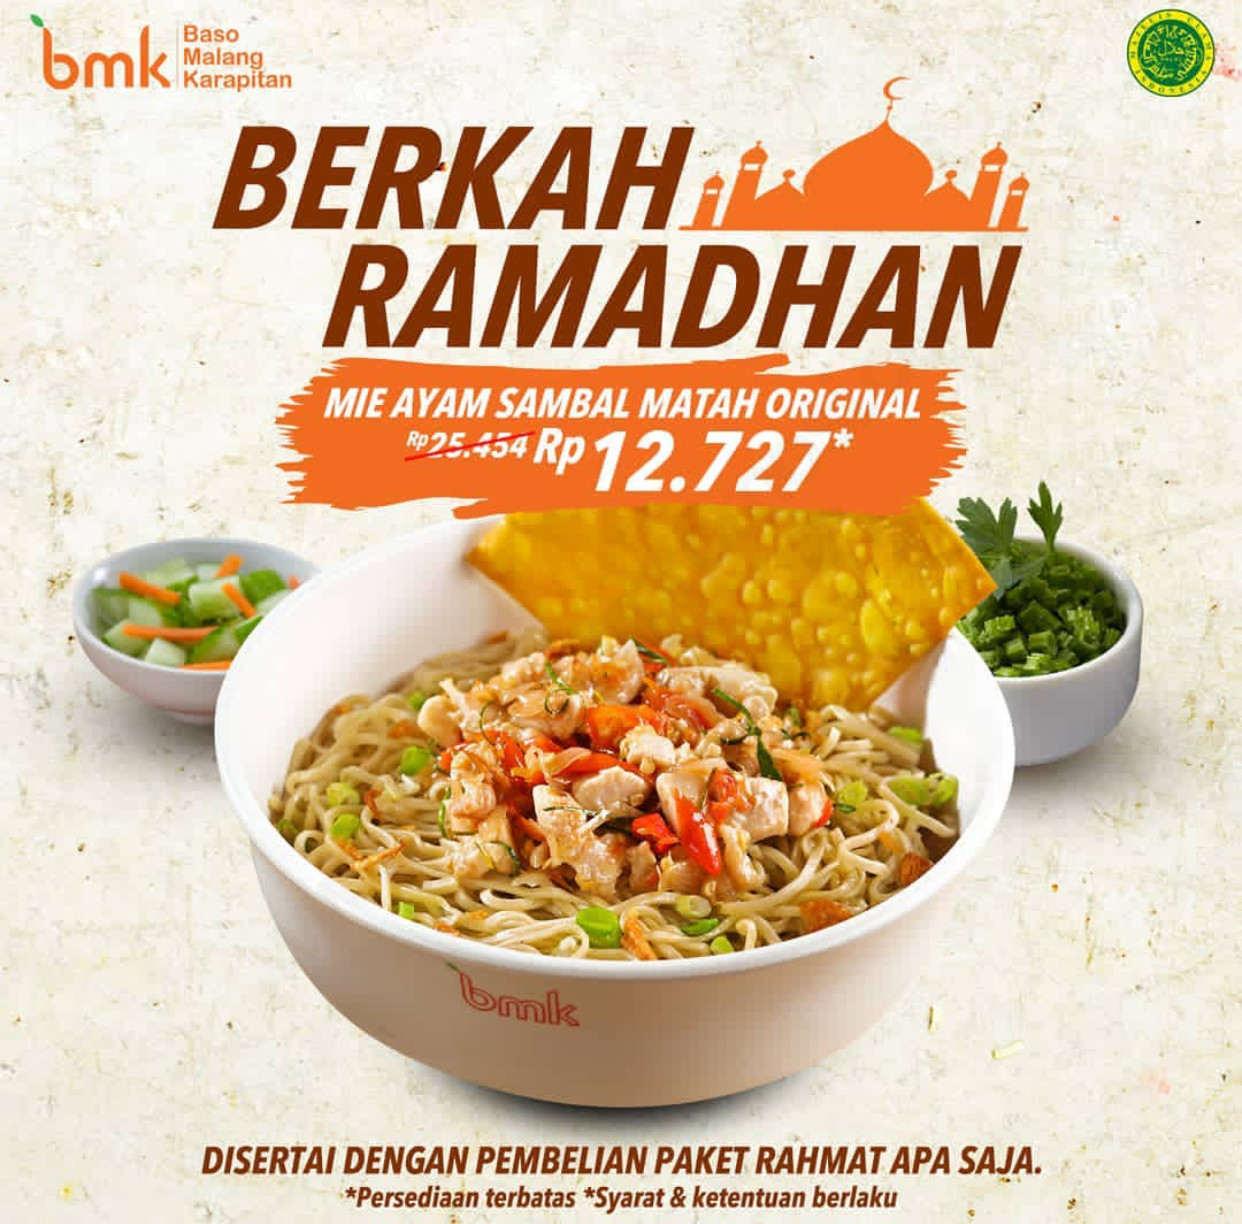 BMK Resto (Bakso Malang Karapitan) Promo Harga Spesial Mie Ayam Sambal Matah Original Hanya Rp. 12.7